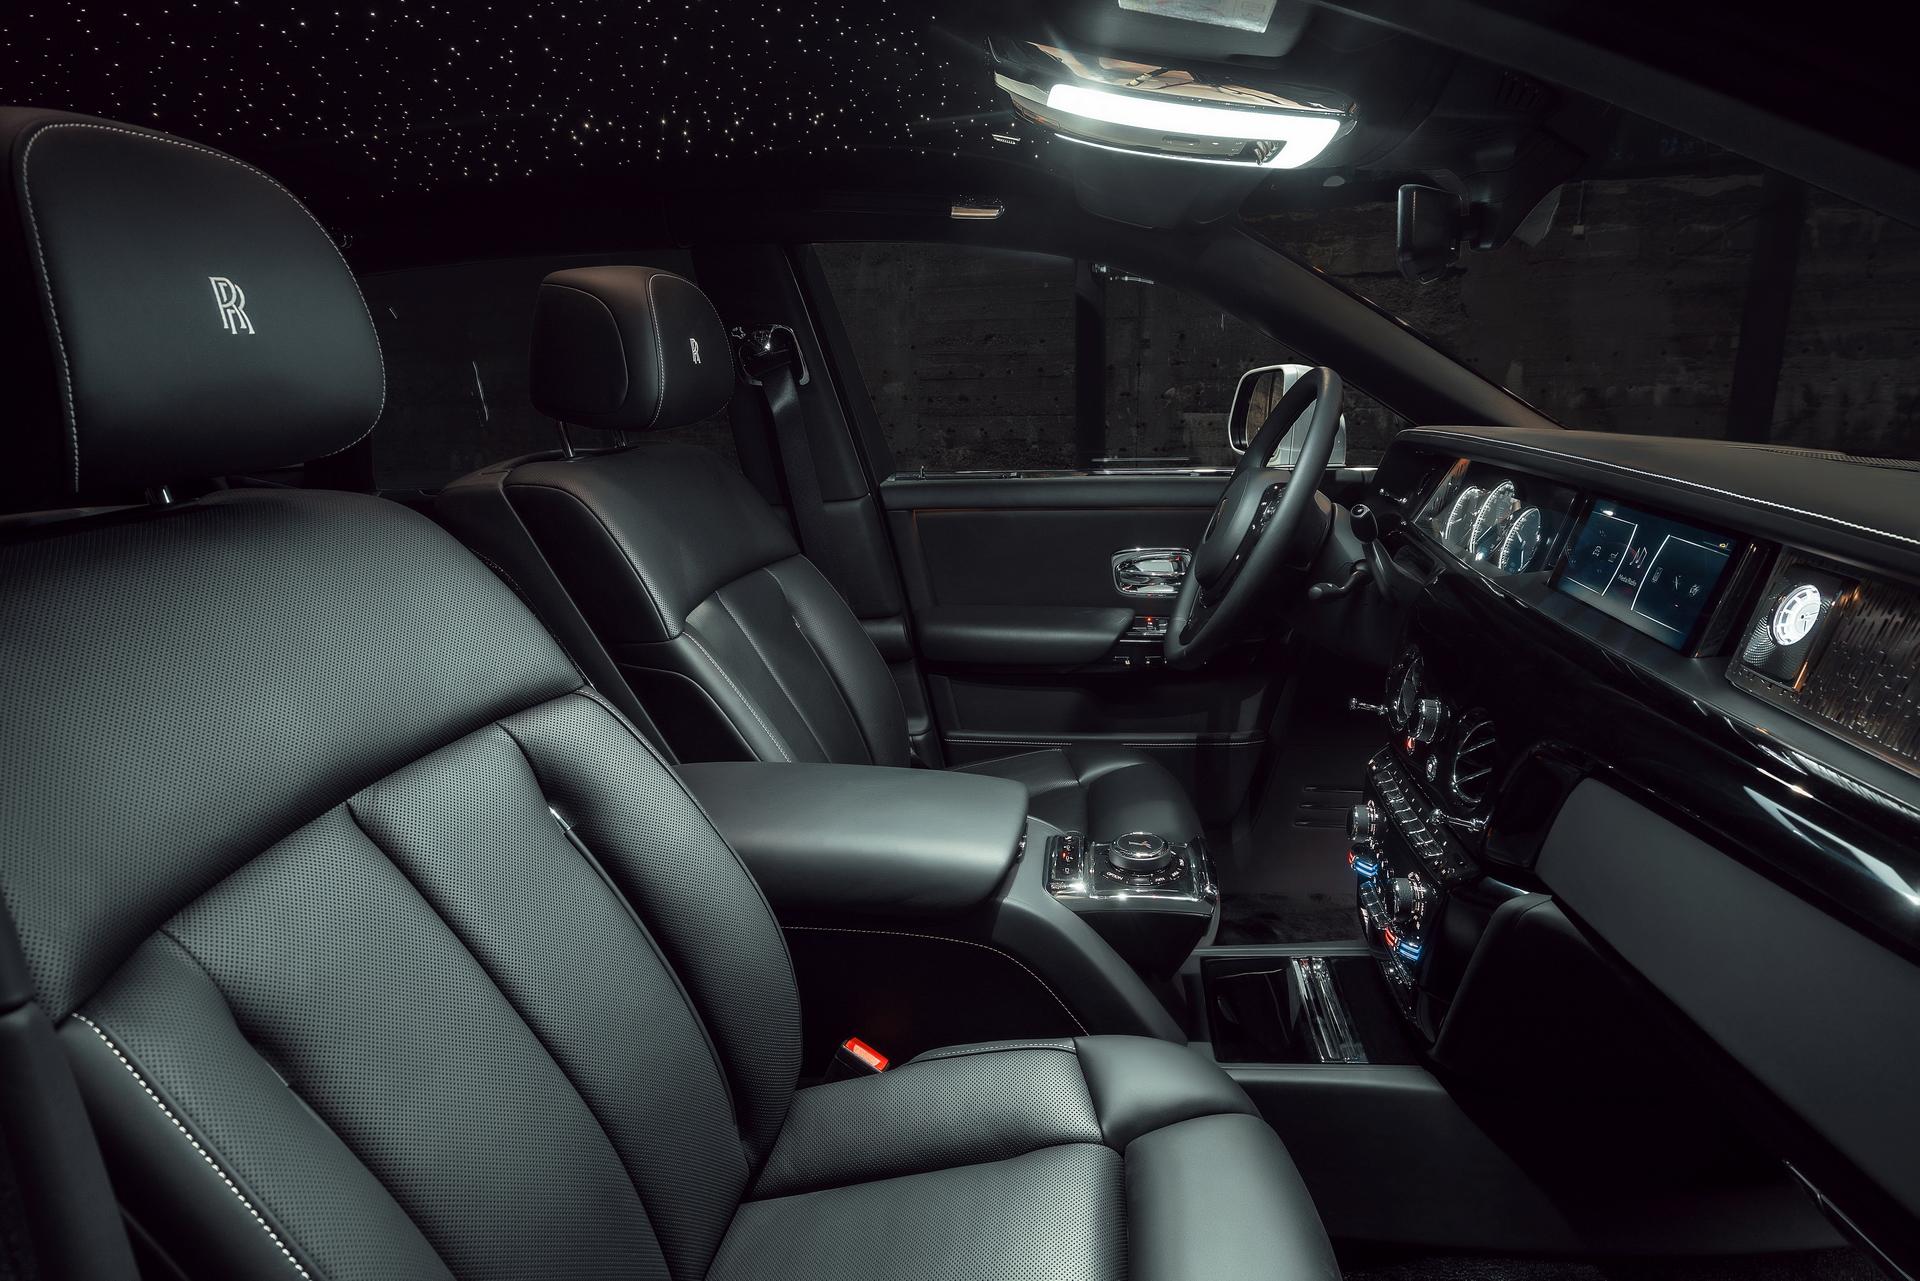 Rolls-Royce Phantom 8 Interior